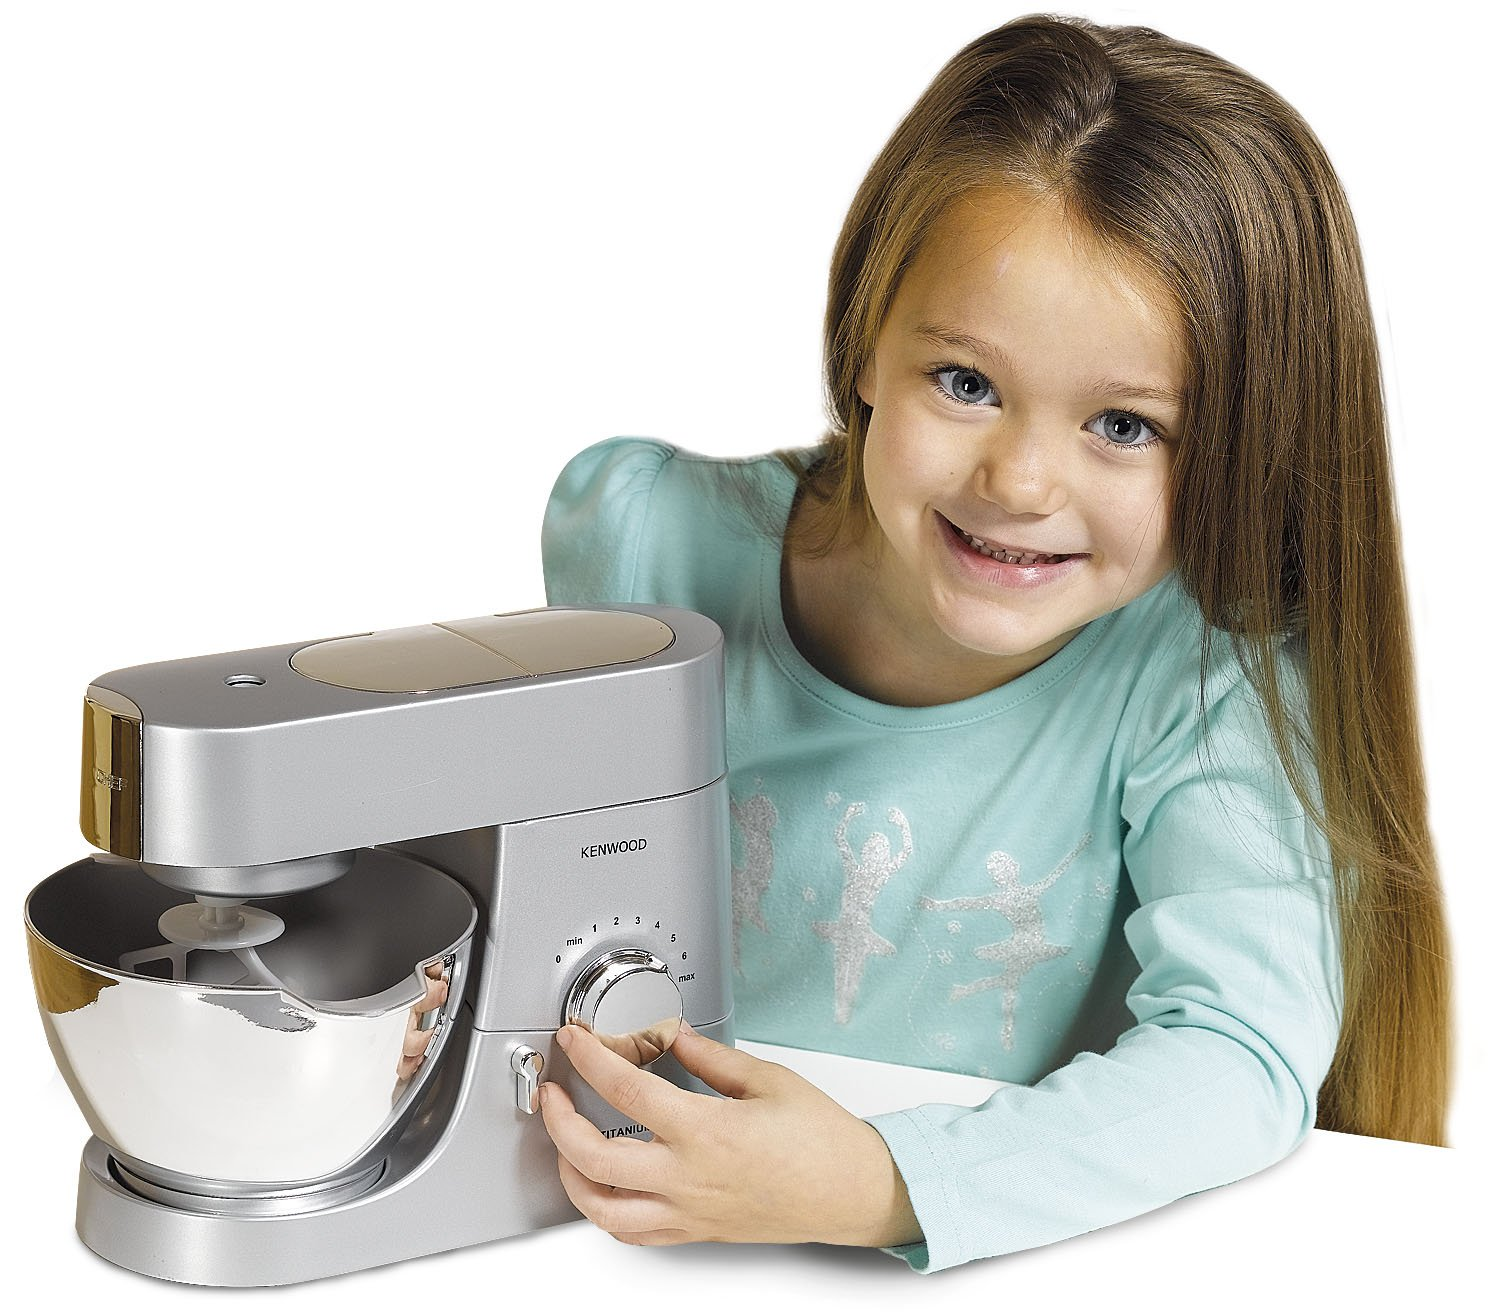 Amazon.com: Casdon Little Cook Kenwood Mixer: Toys & Games